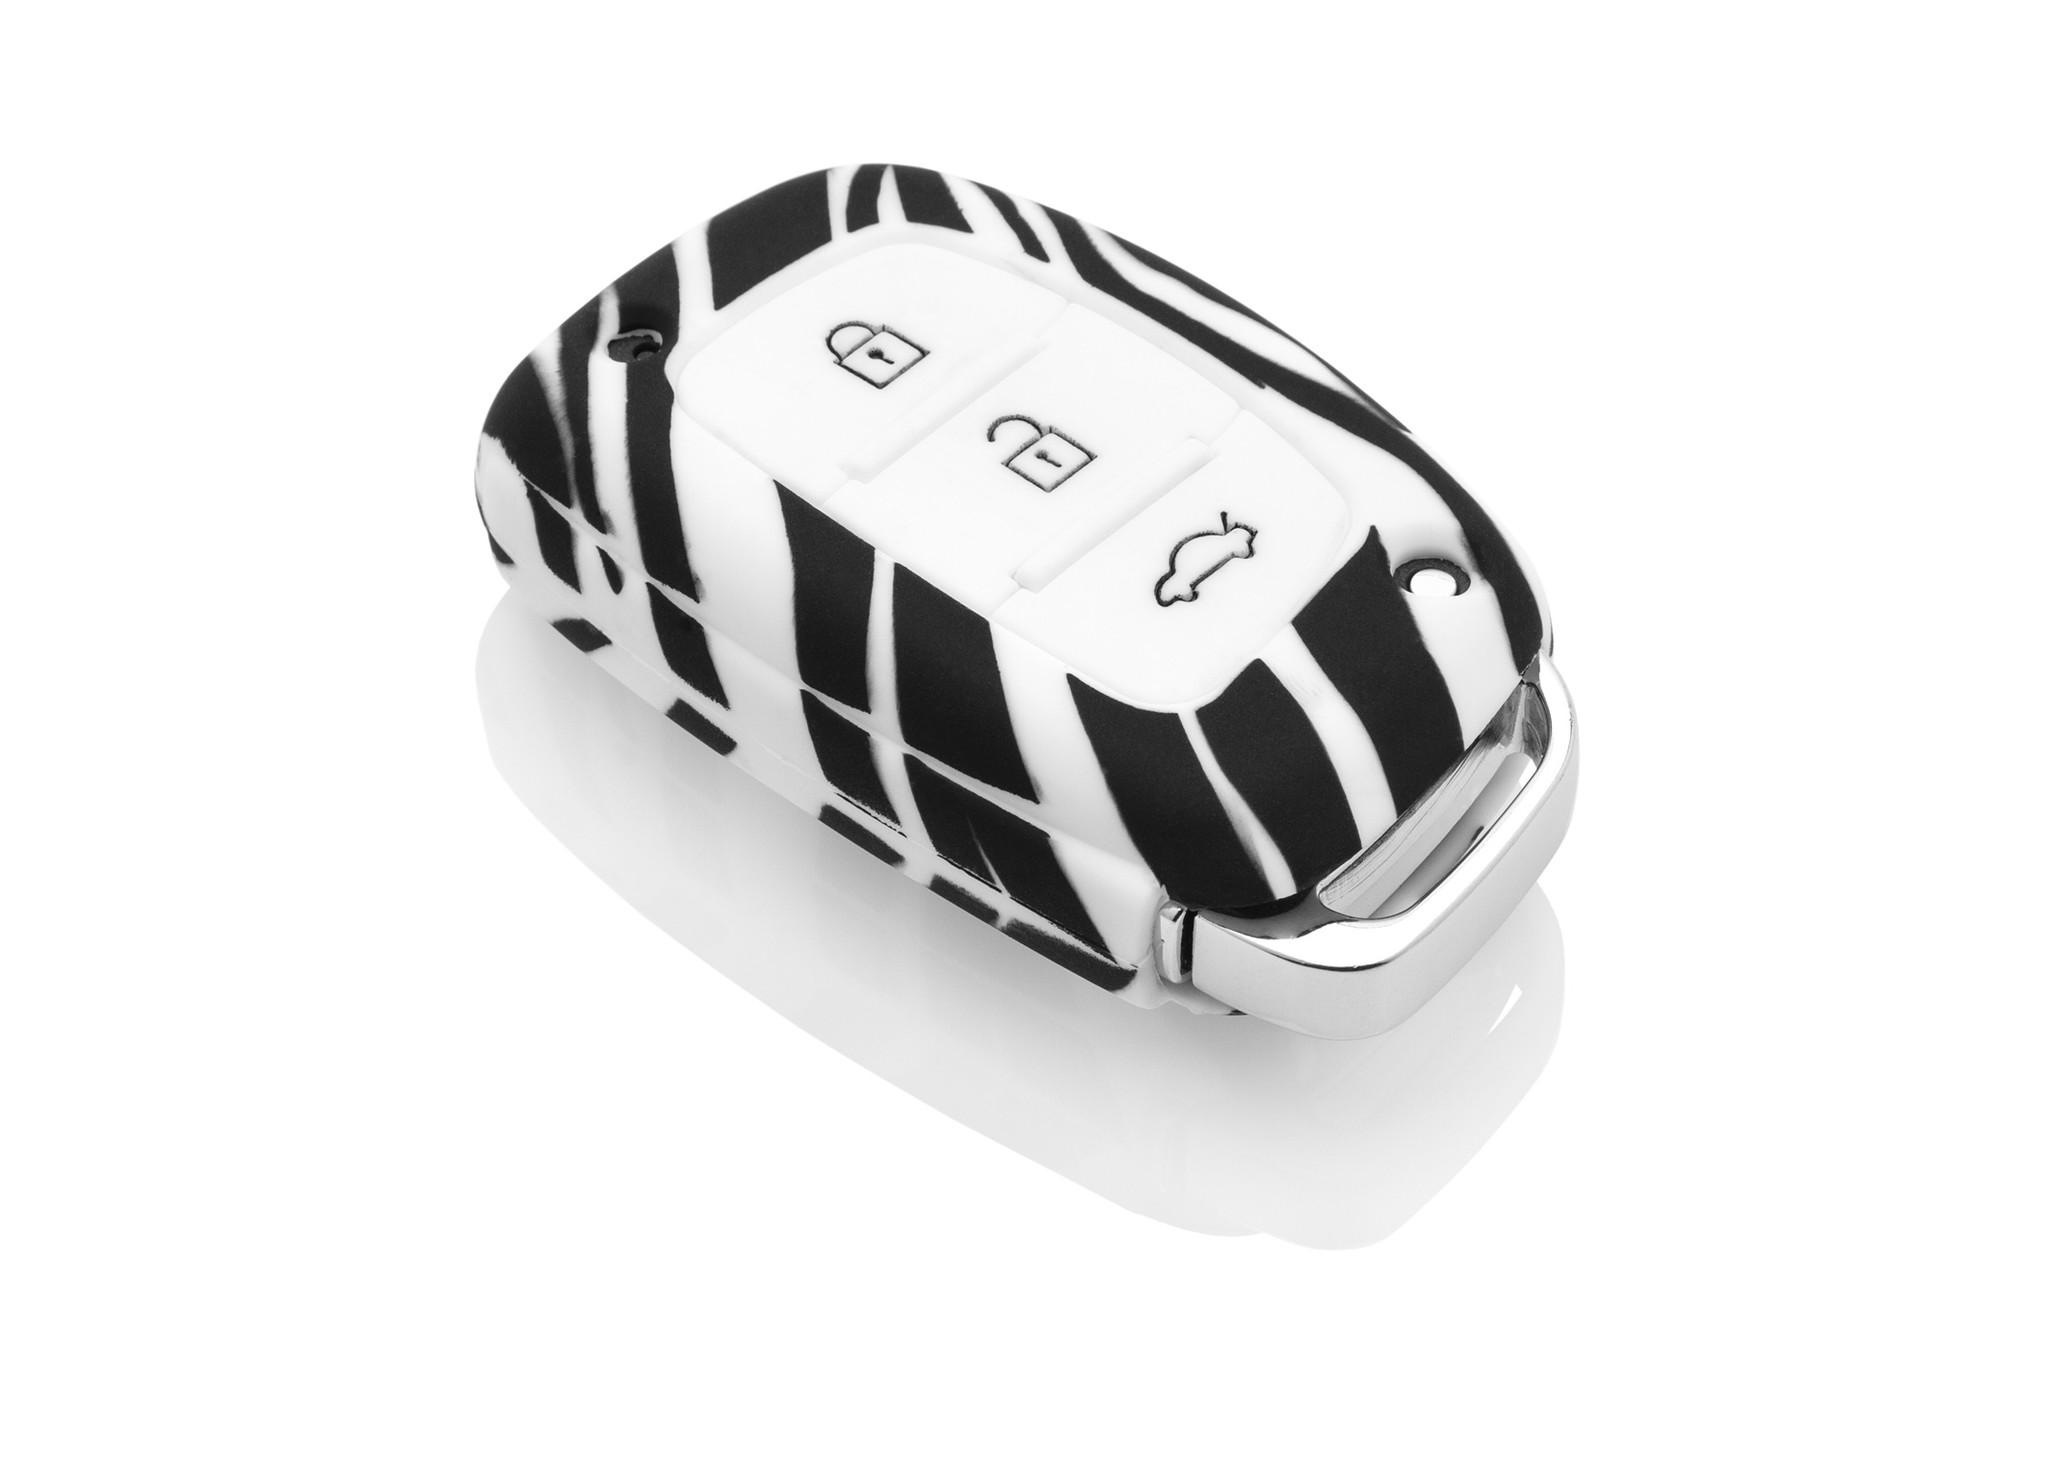 Hyundai Capa Silicone Chave do carro - Capa protetora - Tampa remota FOB - Zebra